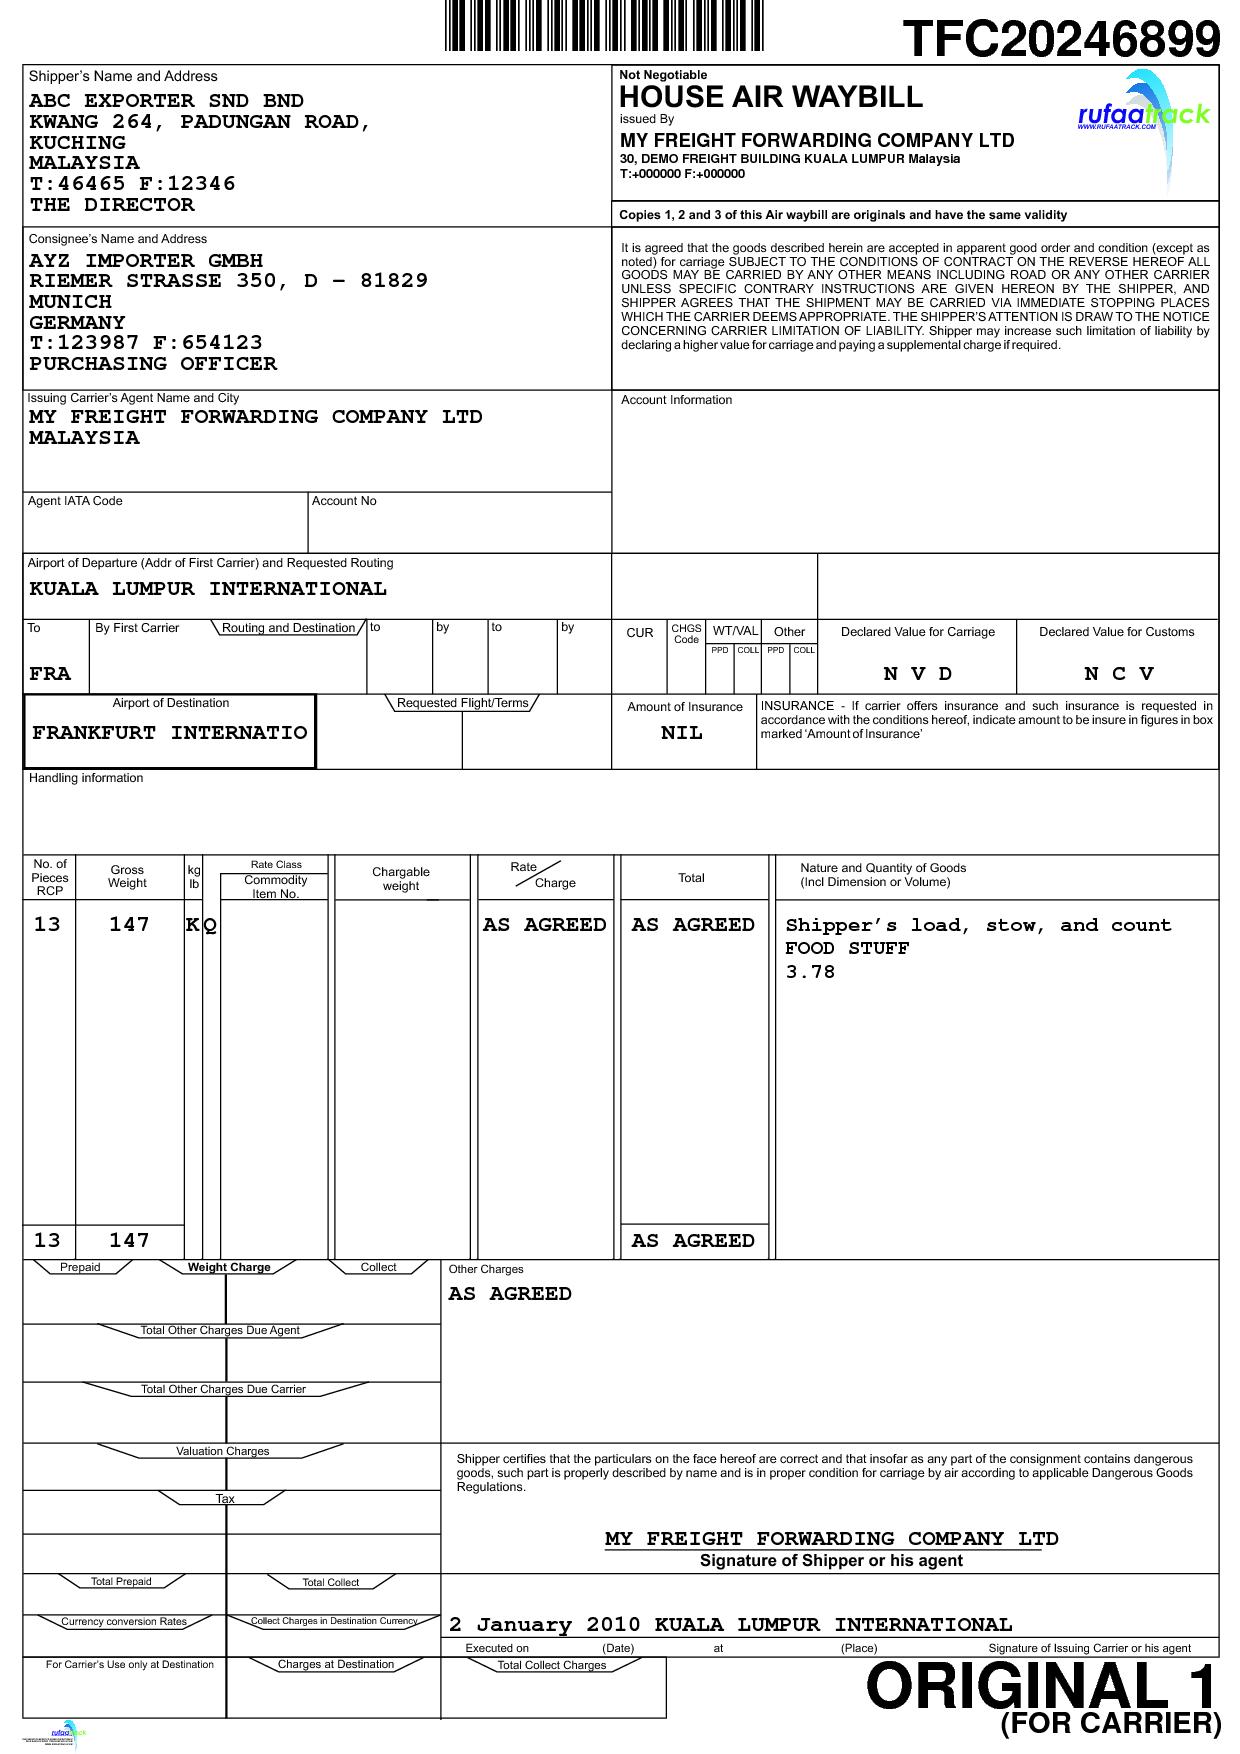 dangerous goods shipping document template